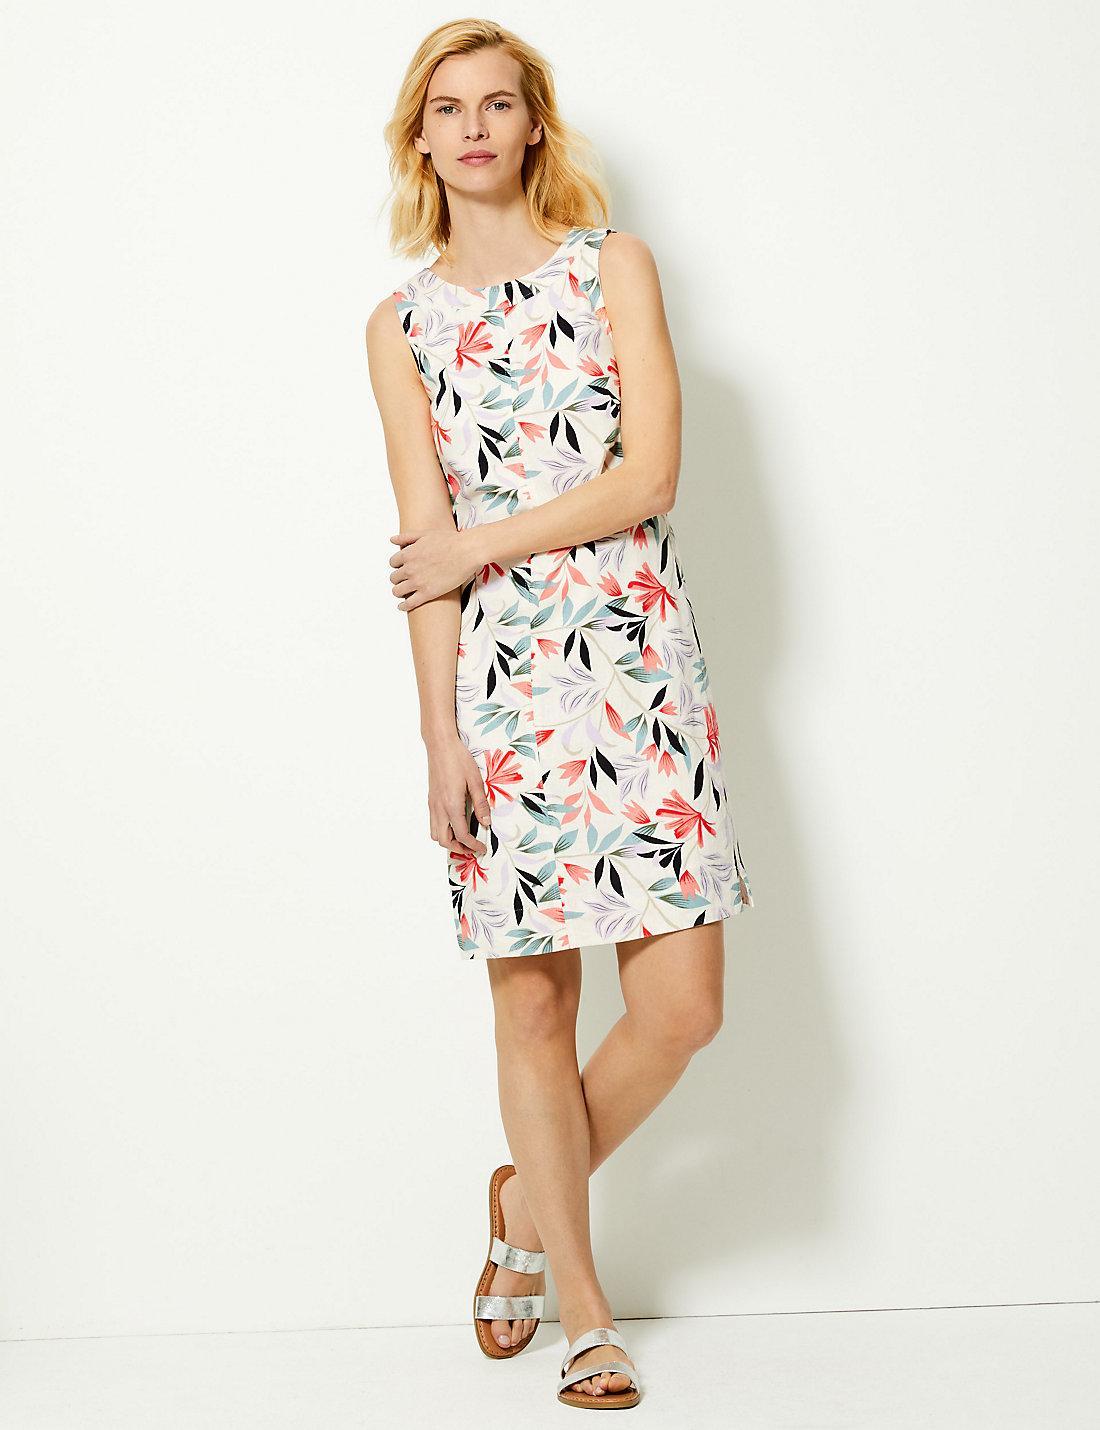 7c1eff9969 Lyst - Marks & Spencer Leaf Print Shift Dress in White